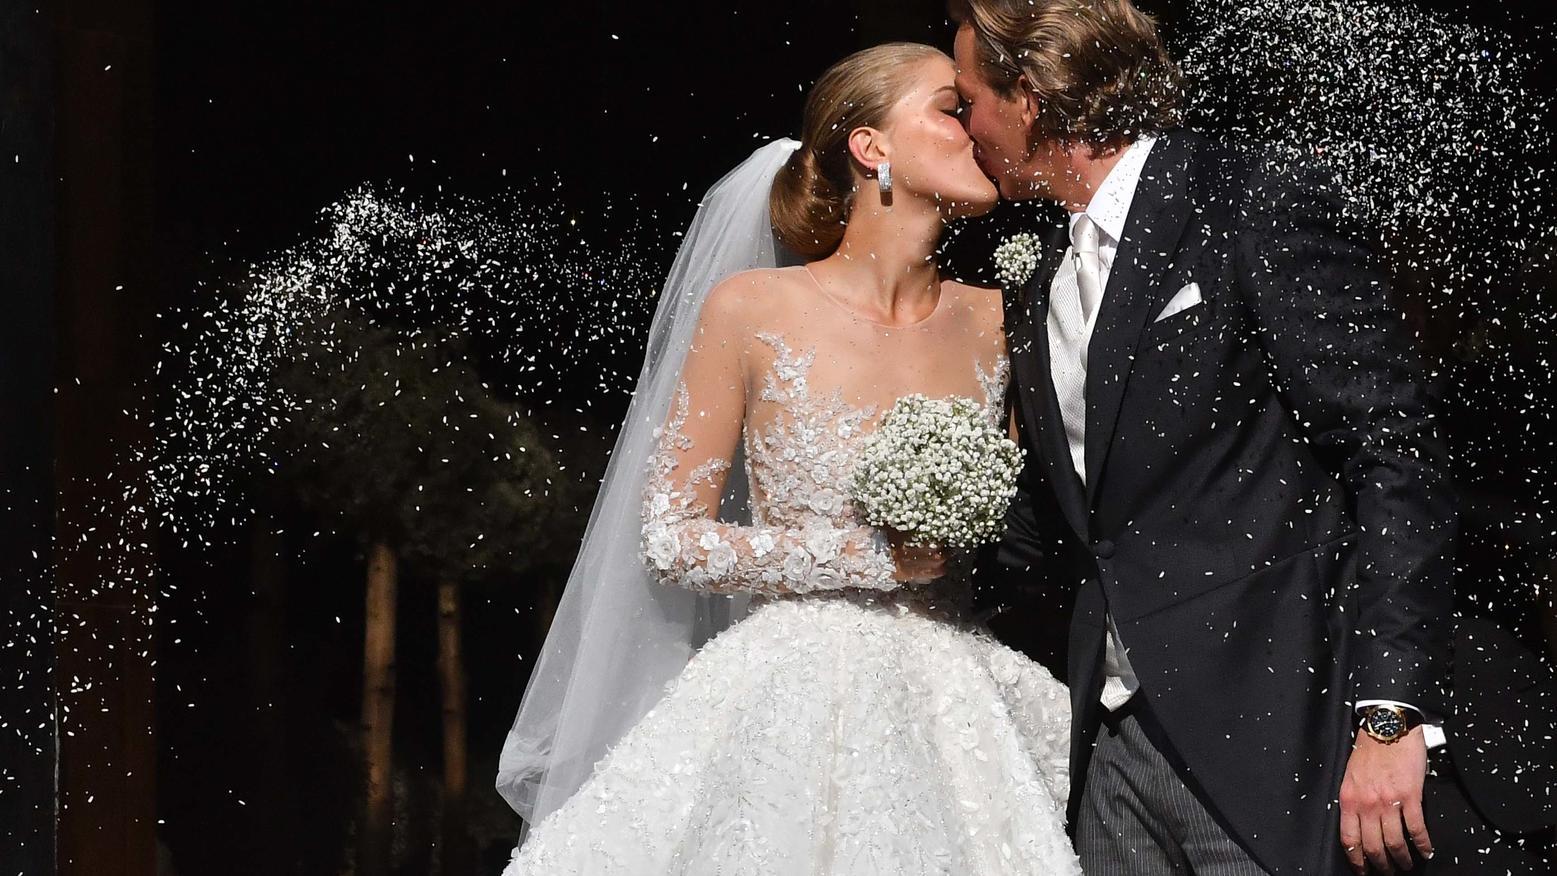 Swarovski: Hochzeitskleid um 800.000 Euro